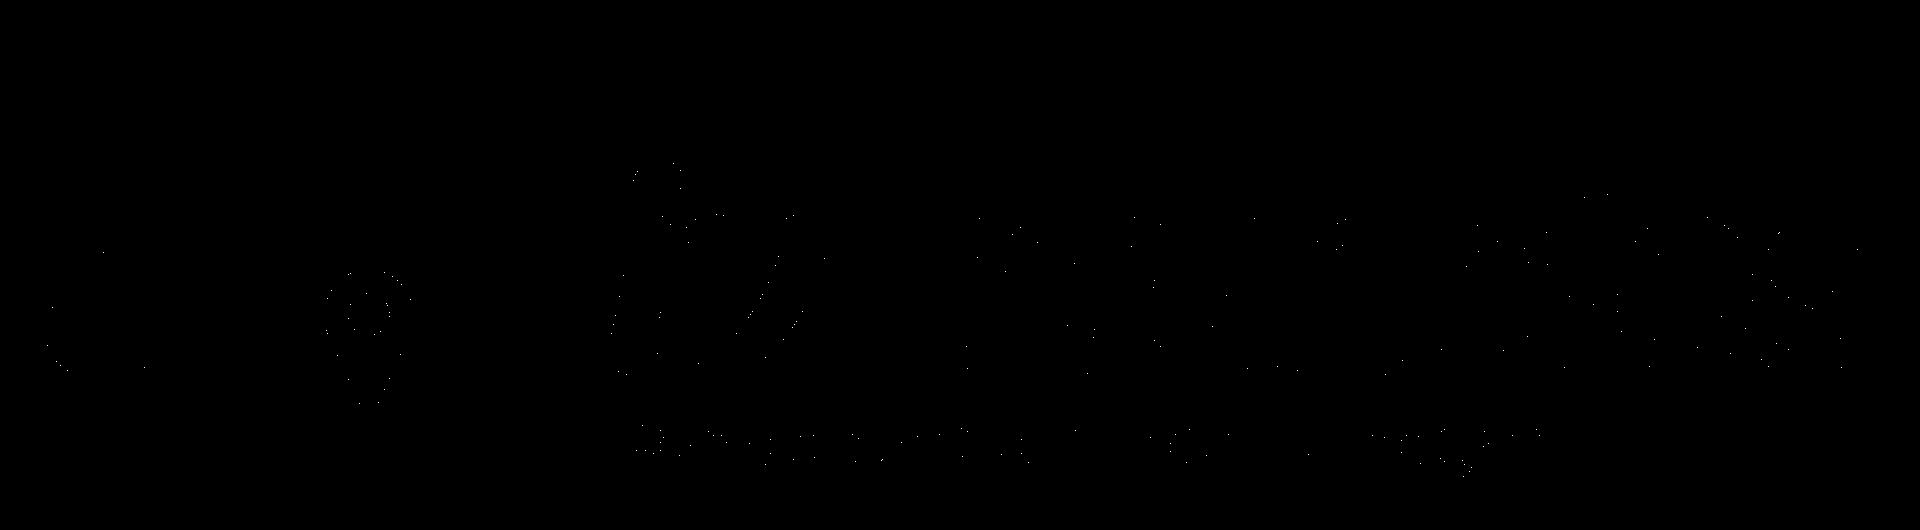 logo Vivanuncios  byn